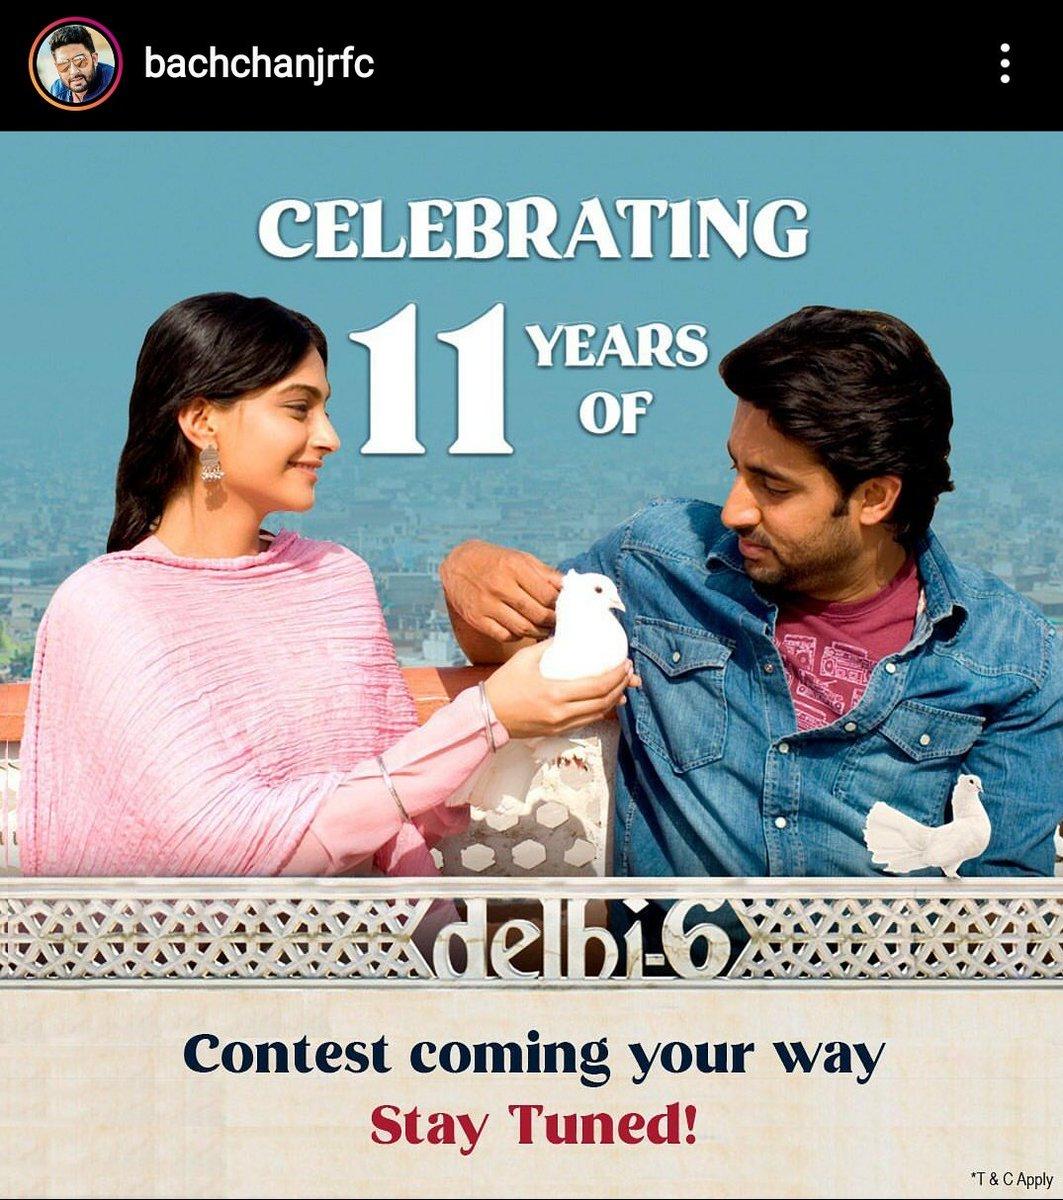 On Instagram,  @BachchanJrFC #AbhishekBachchan #11YearsOfDelhi6 #contest